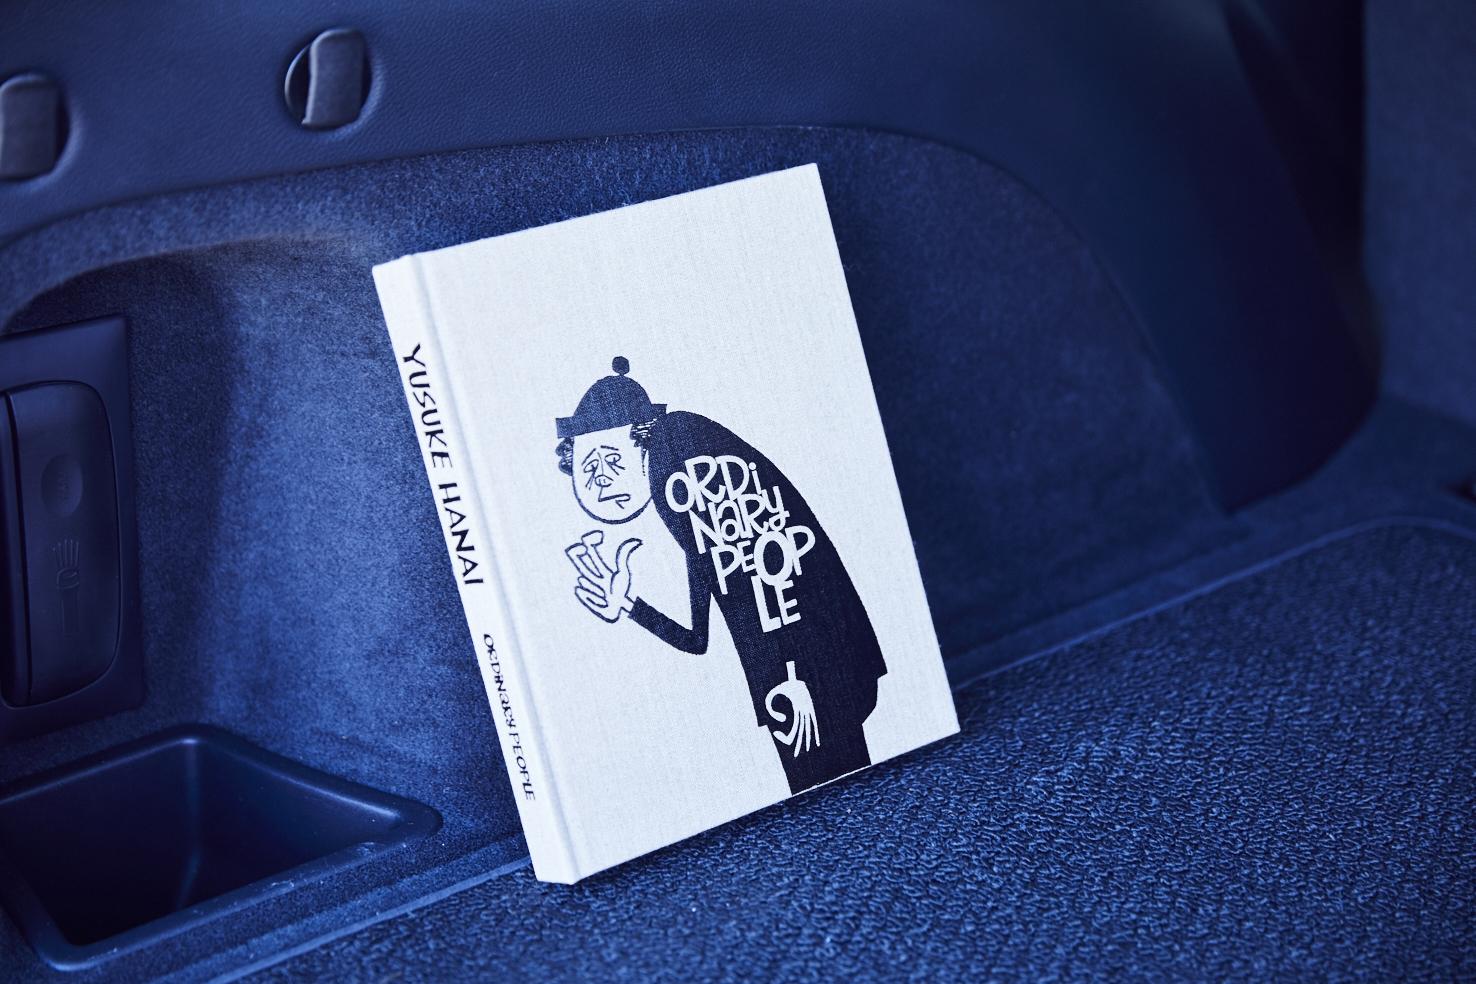 j_1091 アーティスト・花井祐介さんが車に積んでいる愛用品8選【MY STANDARD】